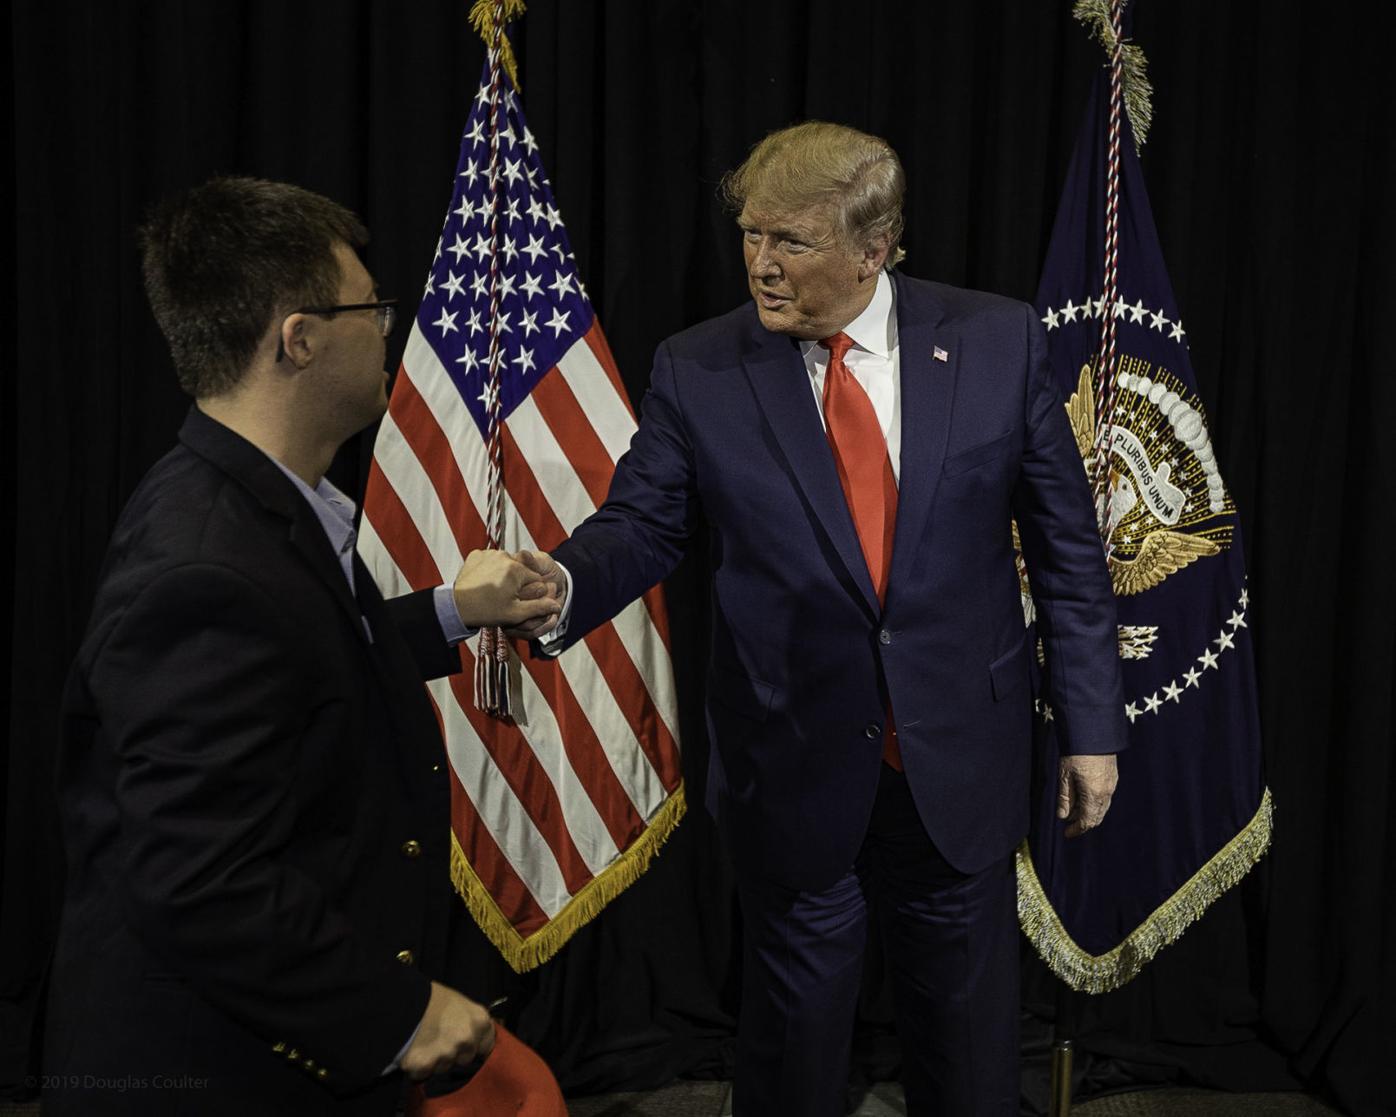 Spencer Kirkpatrick and Donald Trump